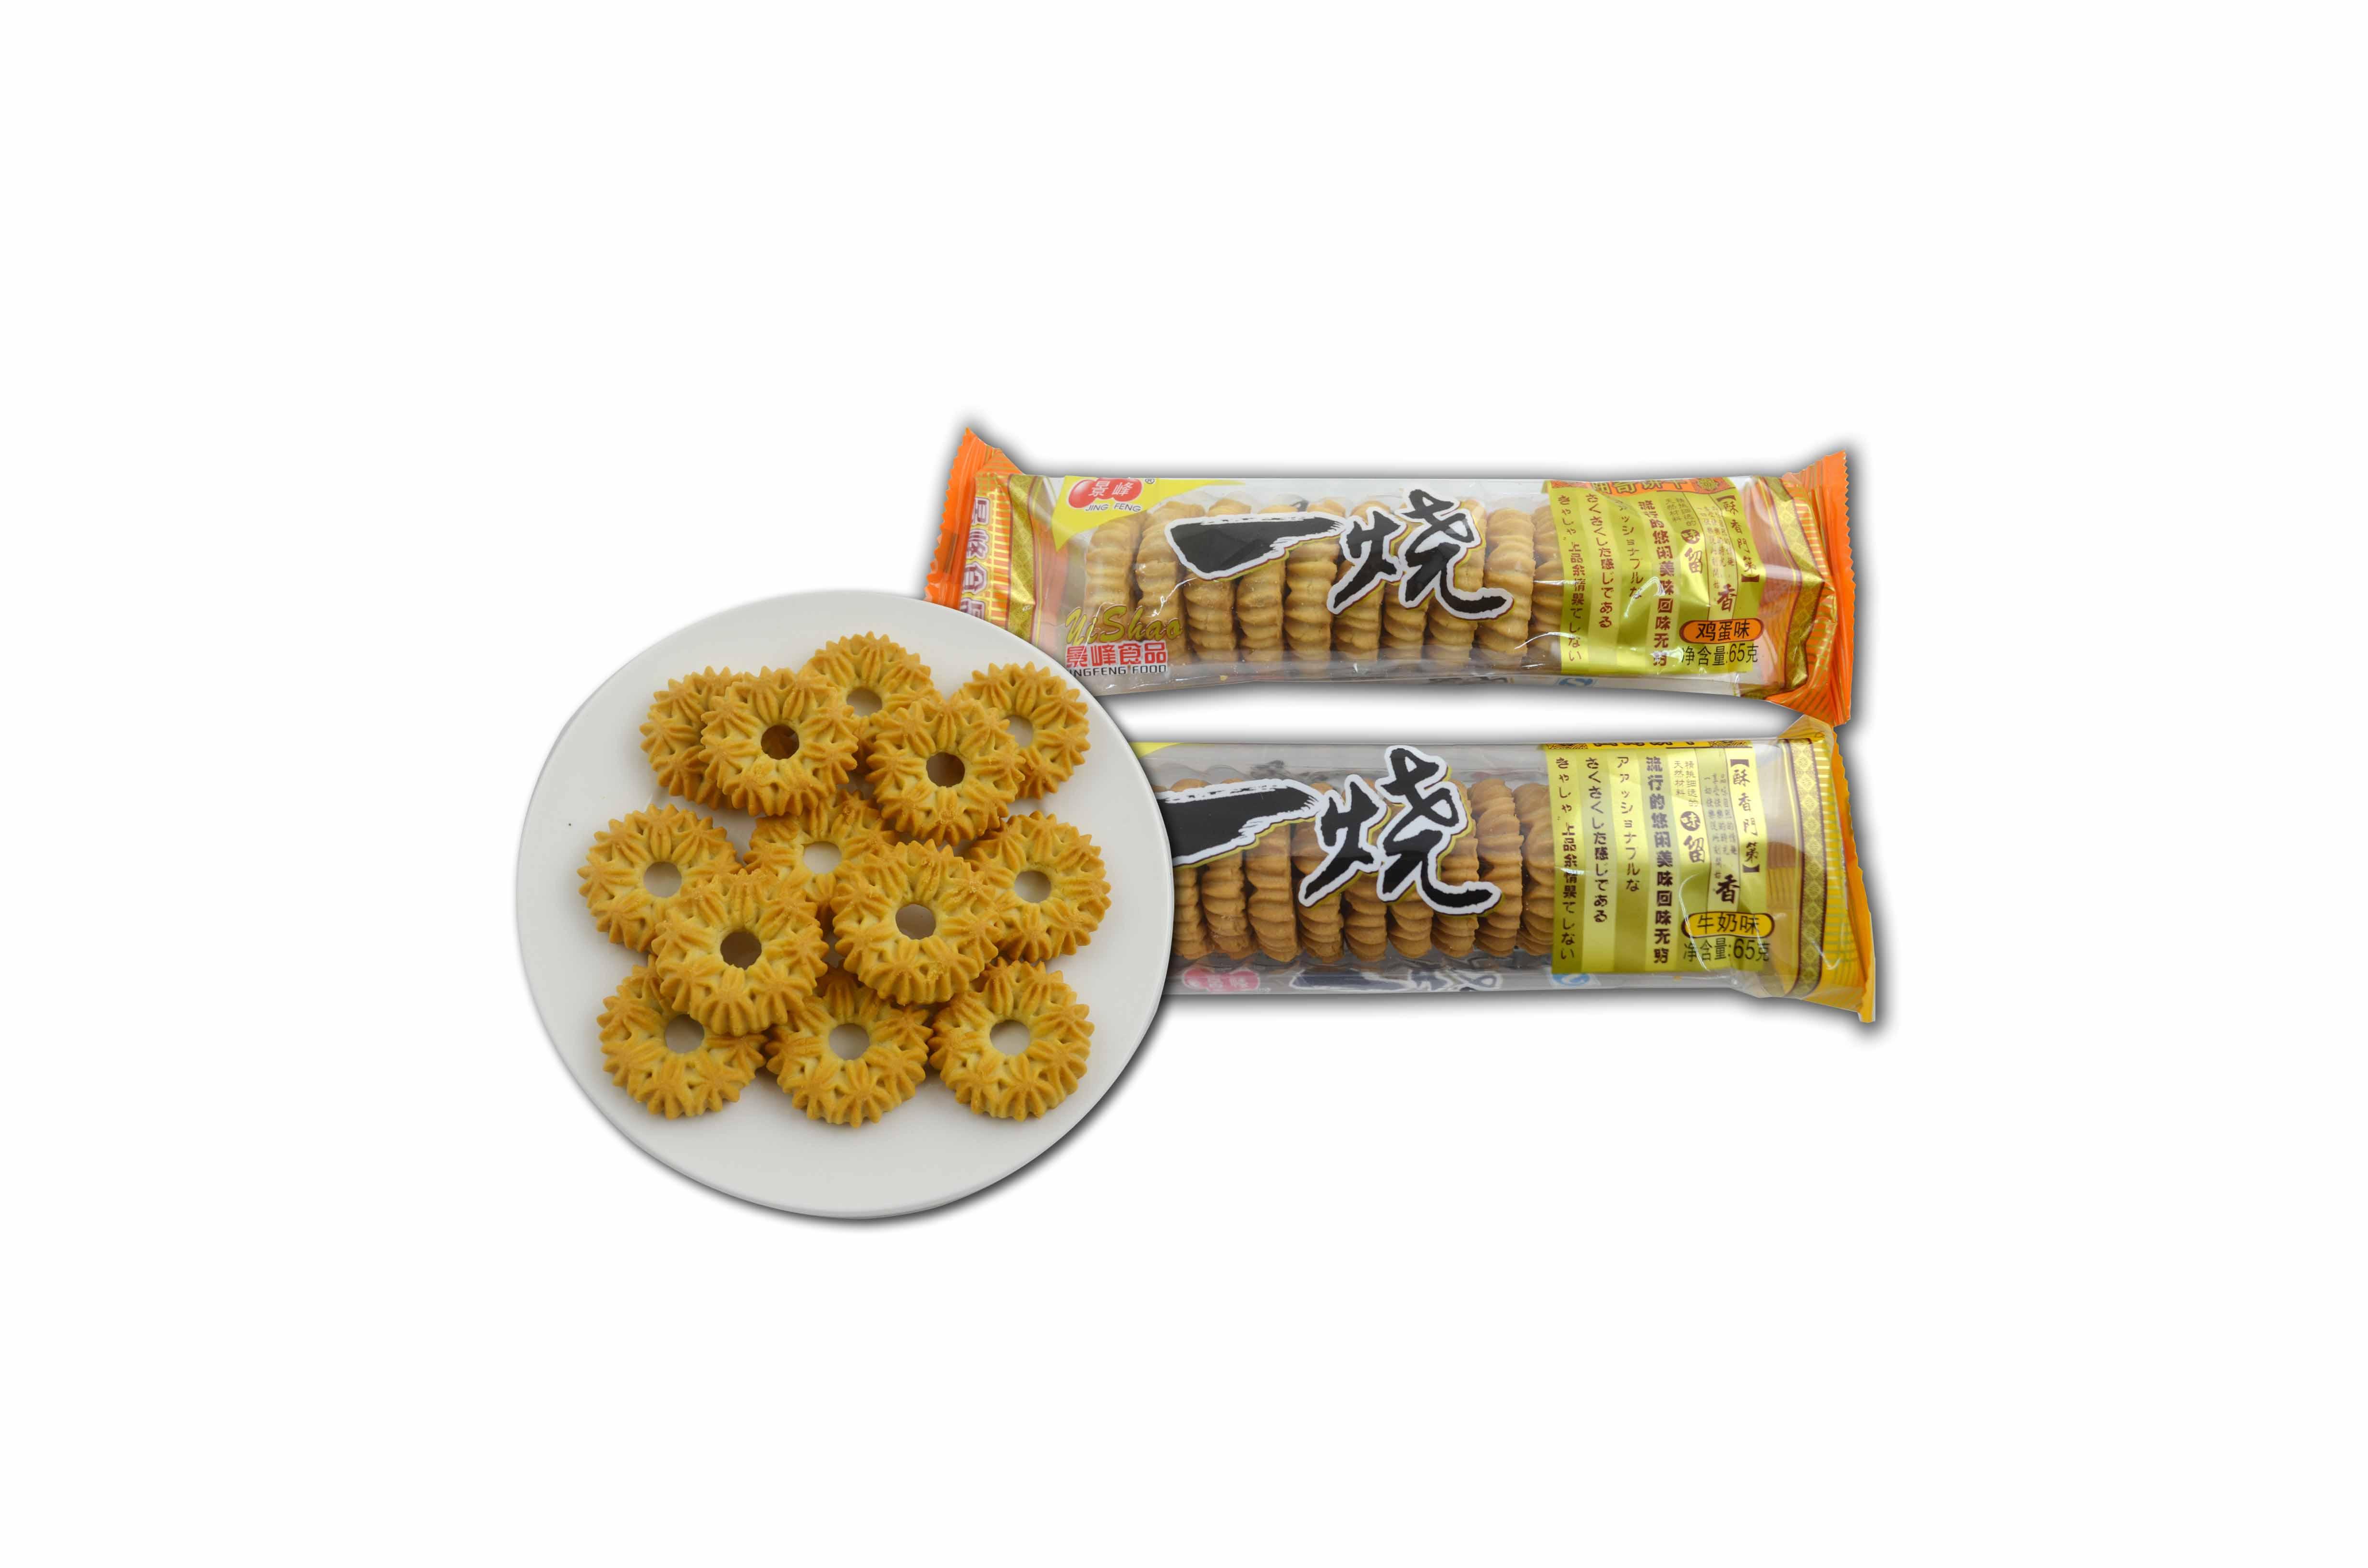 A Burn Cookies (65g)